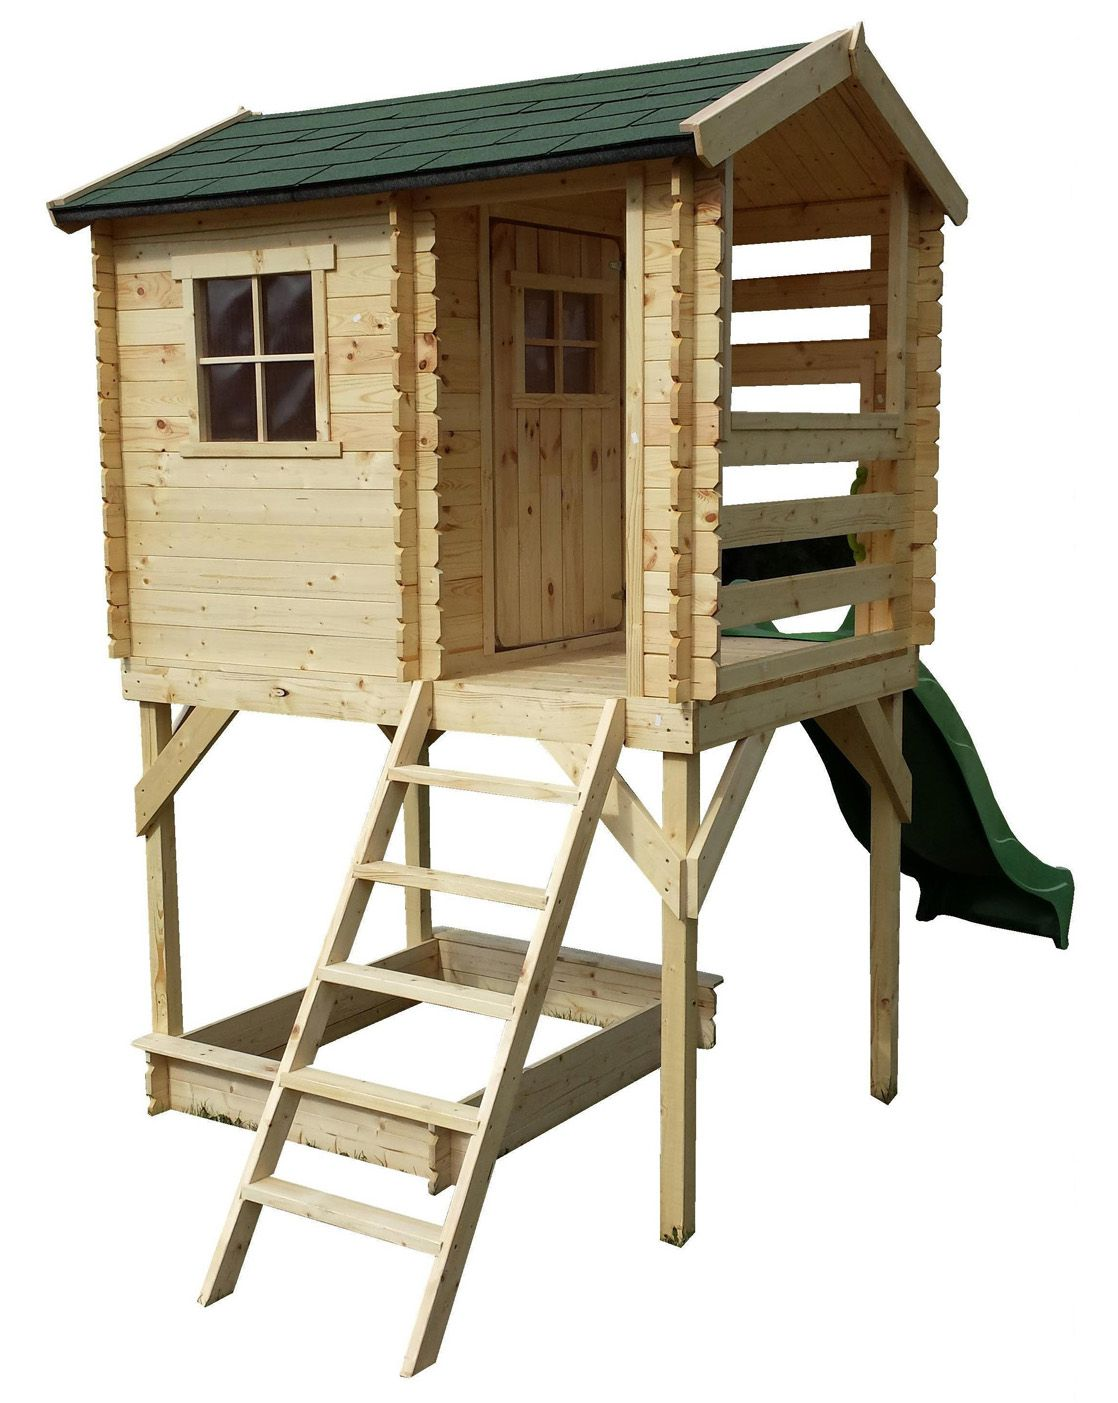 Spielhaus Hannah inkl. Rutsche - 1,75 x 1,30 Meter aus 19mm Blockbohlen